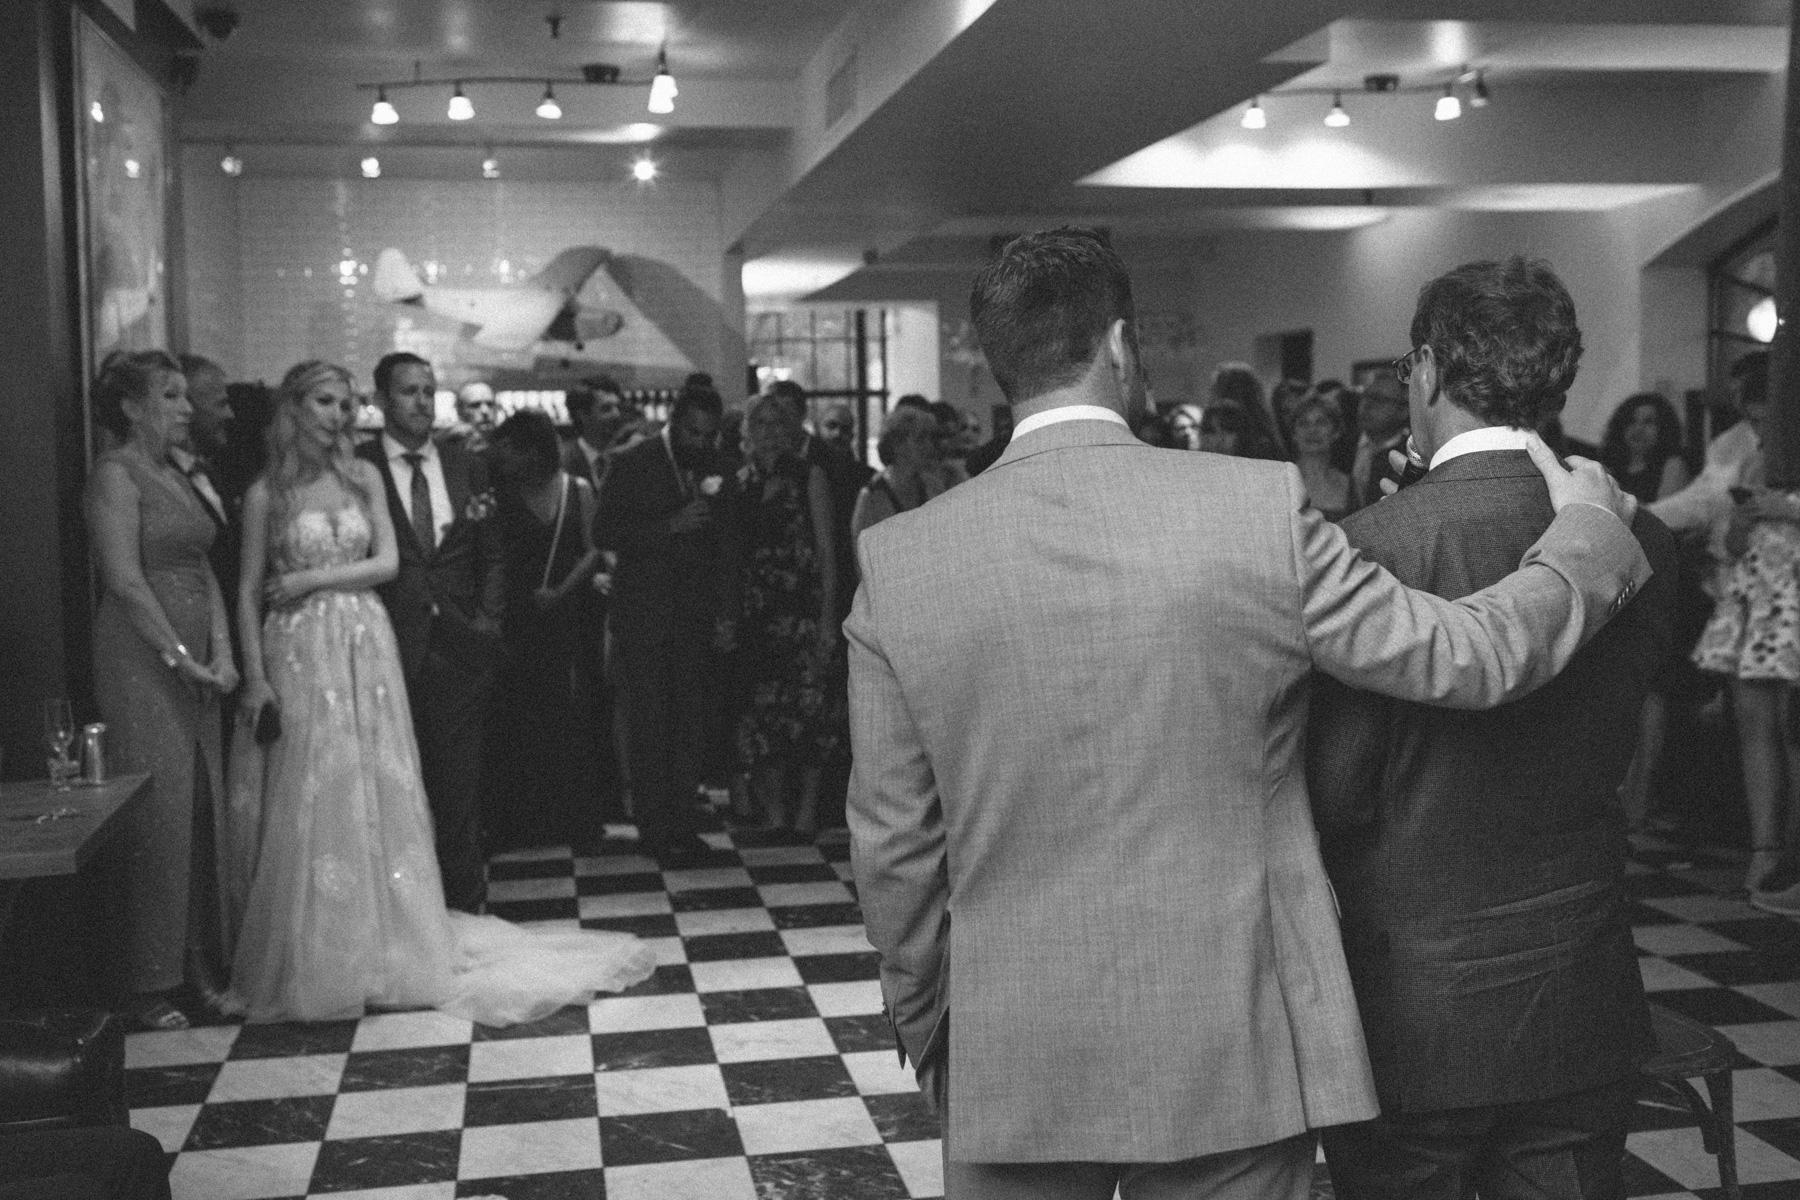 La-Maquette-wedding-by-Toronto-modern-wedding-photographer-Sam-Wong_38.jpg